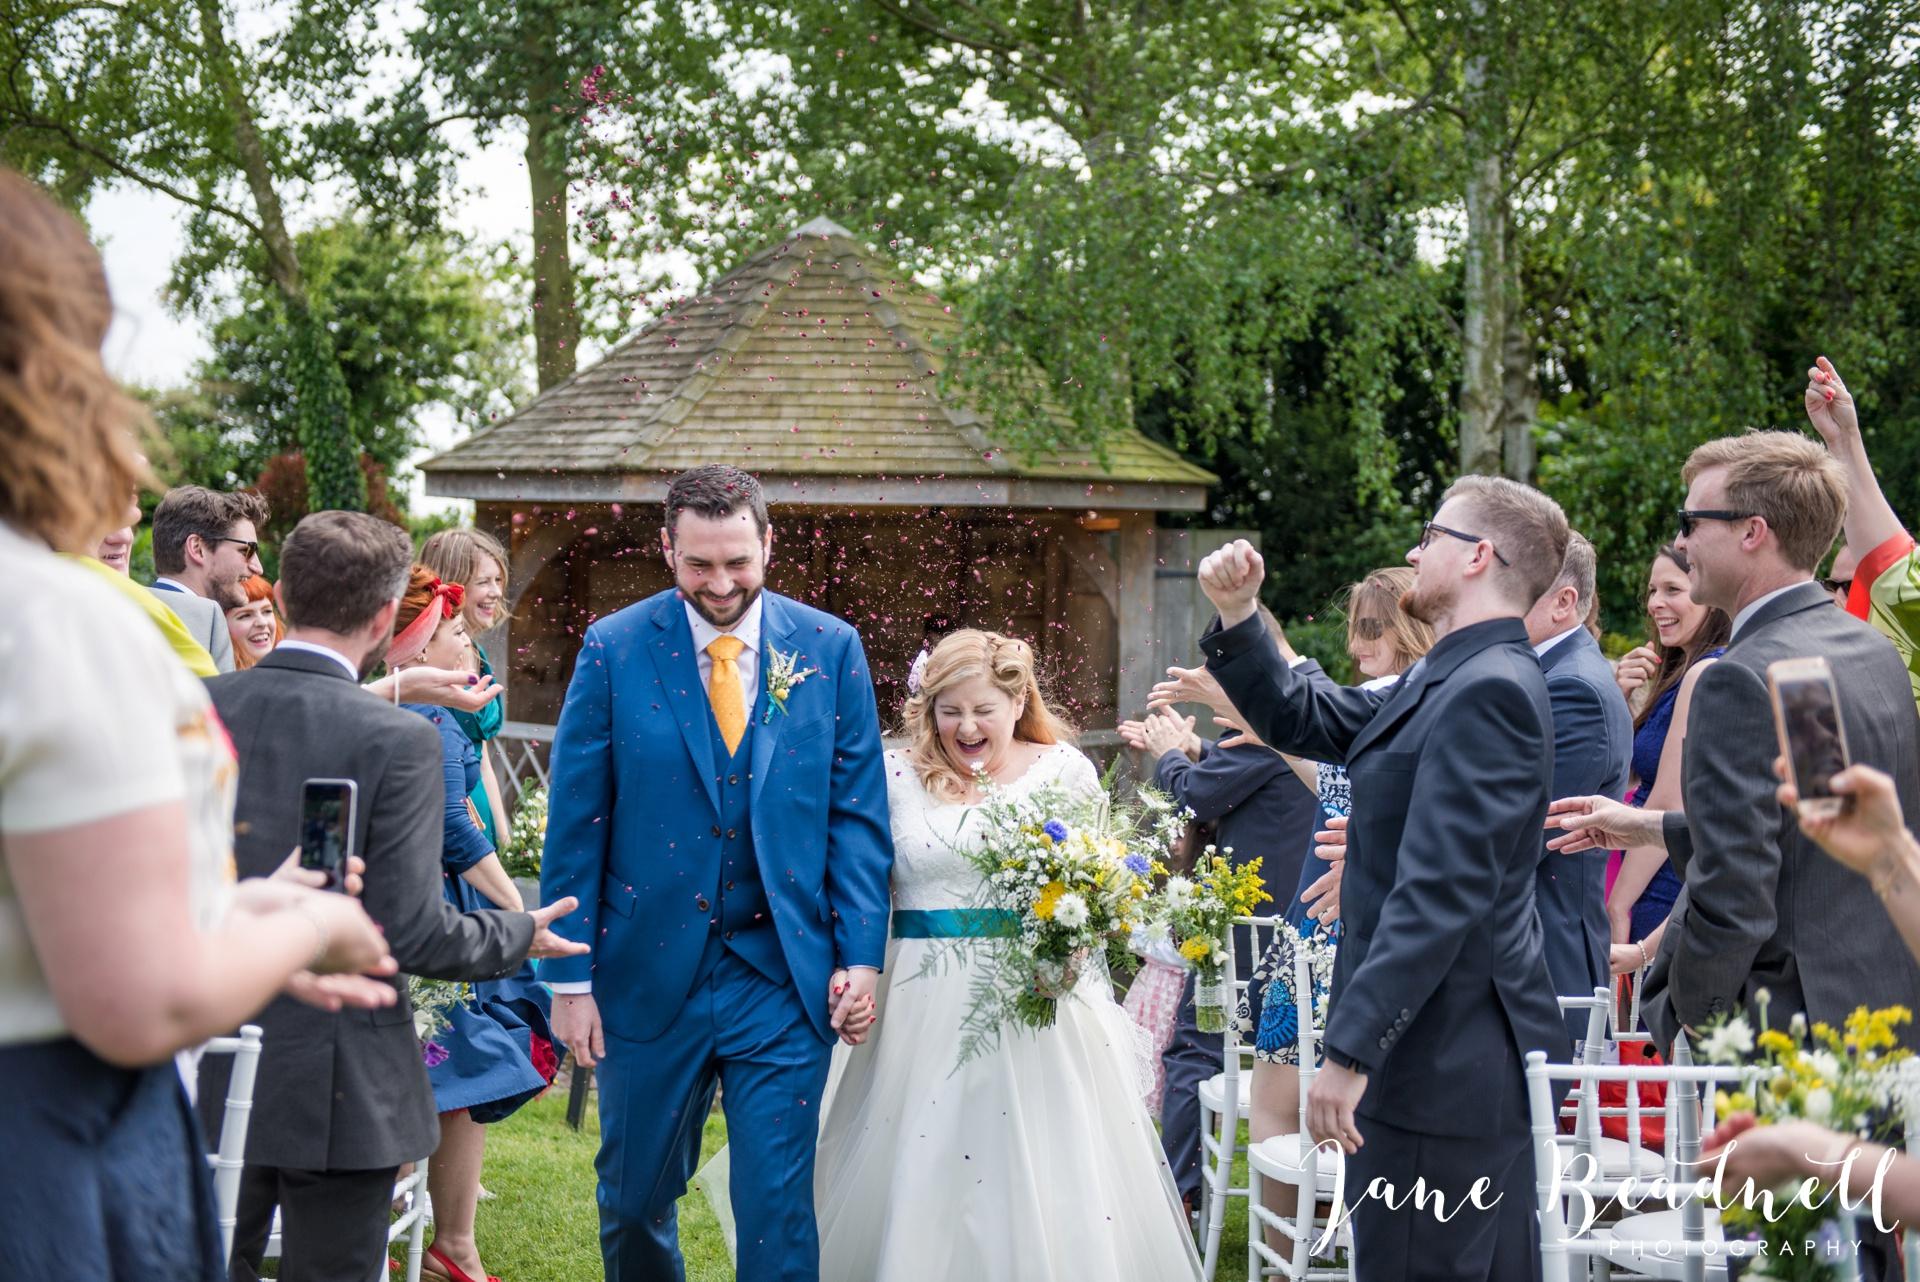 South Farm Wedding photography Hertfordshire by Jane Beadnell Photography fine art wedding photographer_0079